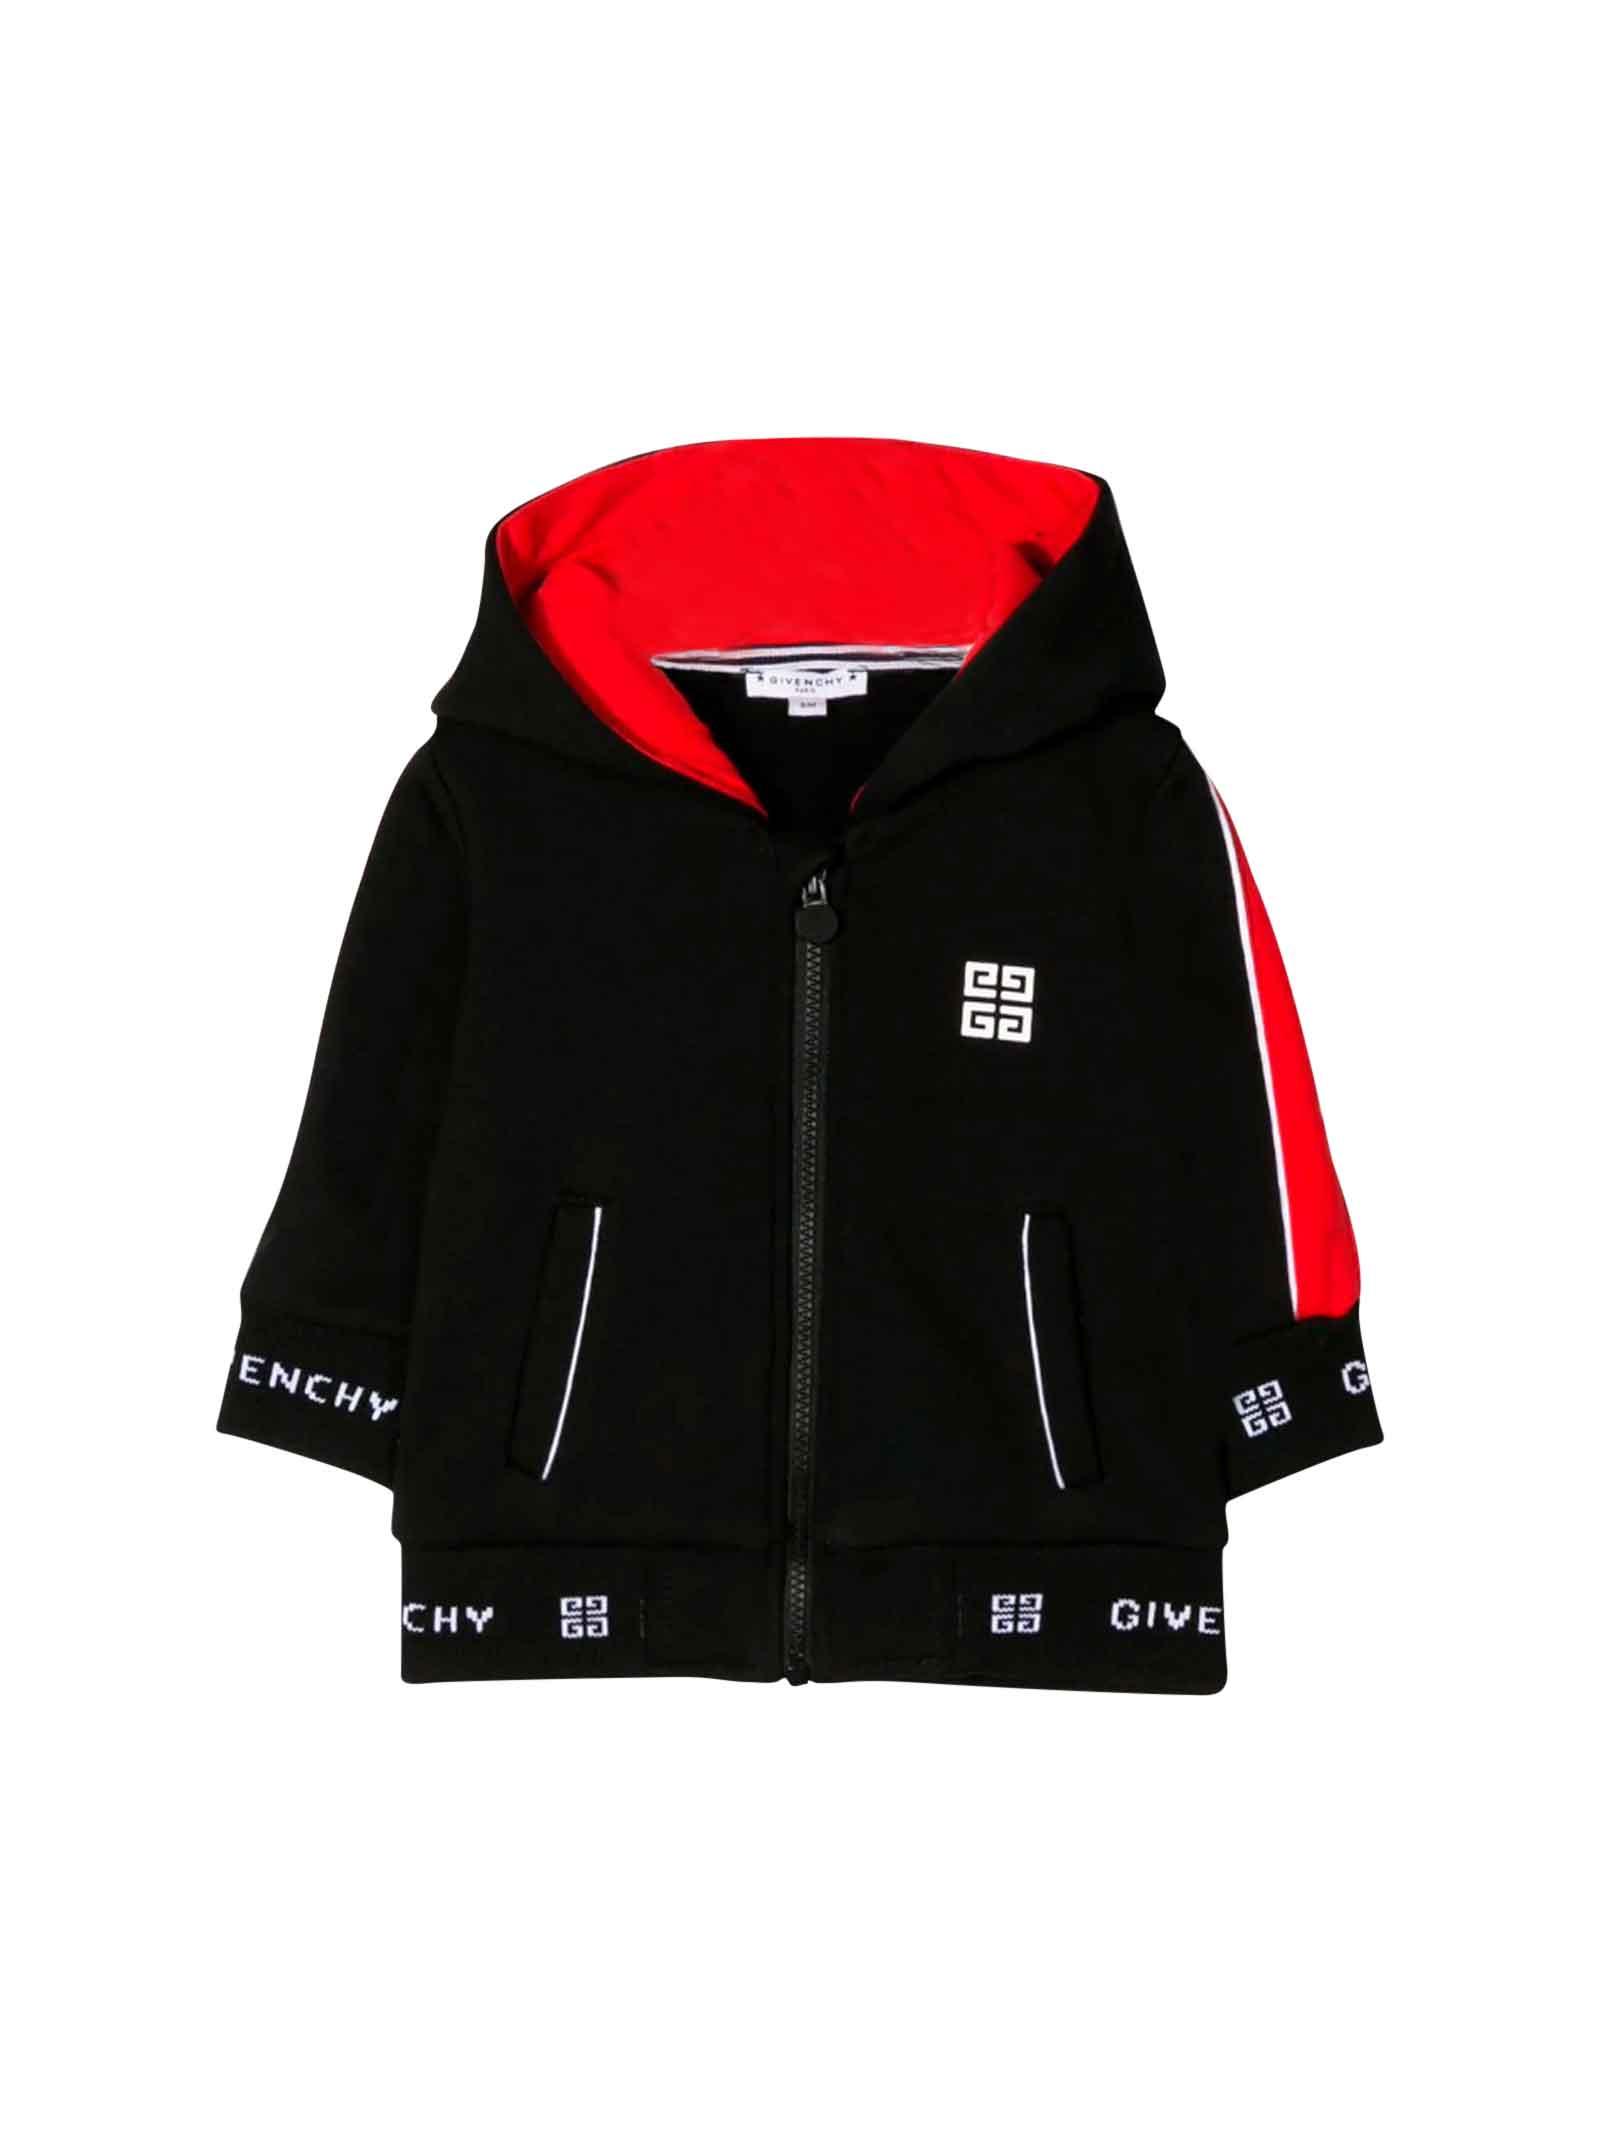 48f5aabb2822c Givenchy Givenchy Black Sweatshirt Baby - Nero - 11009705 | italist